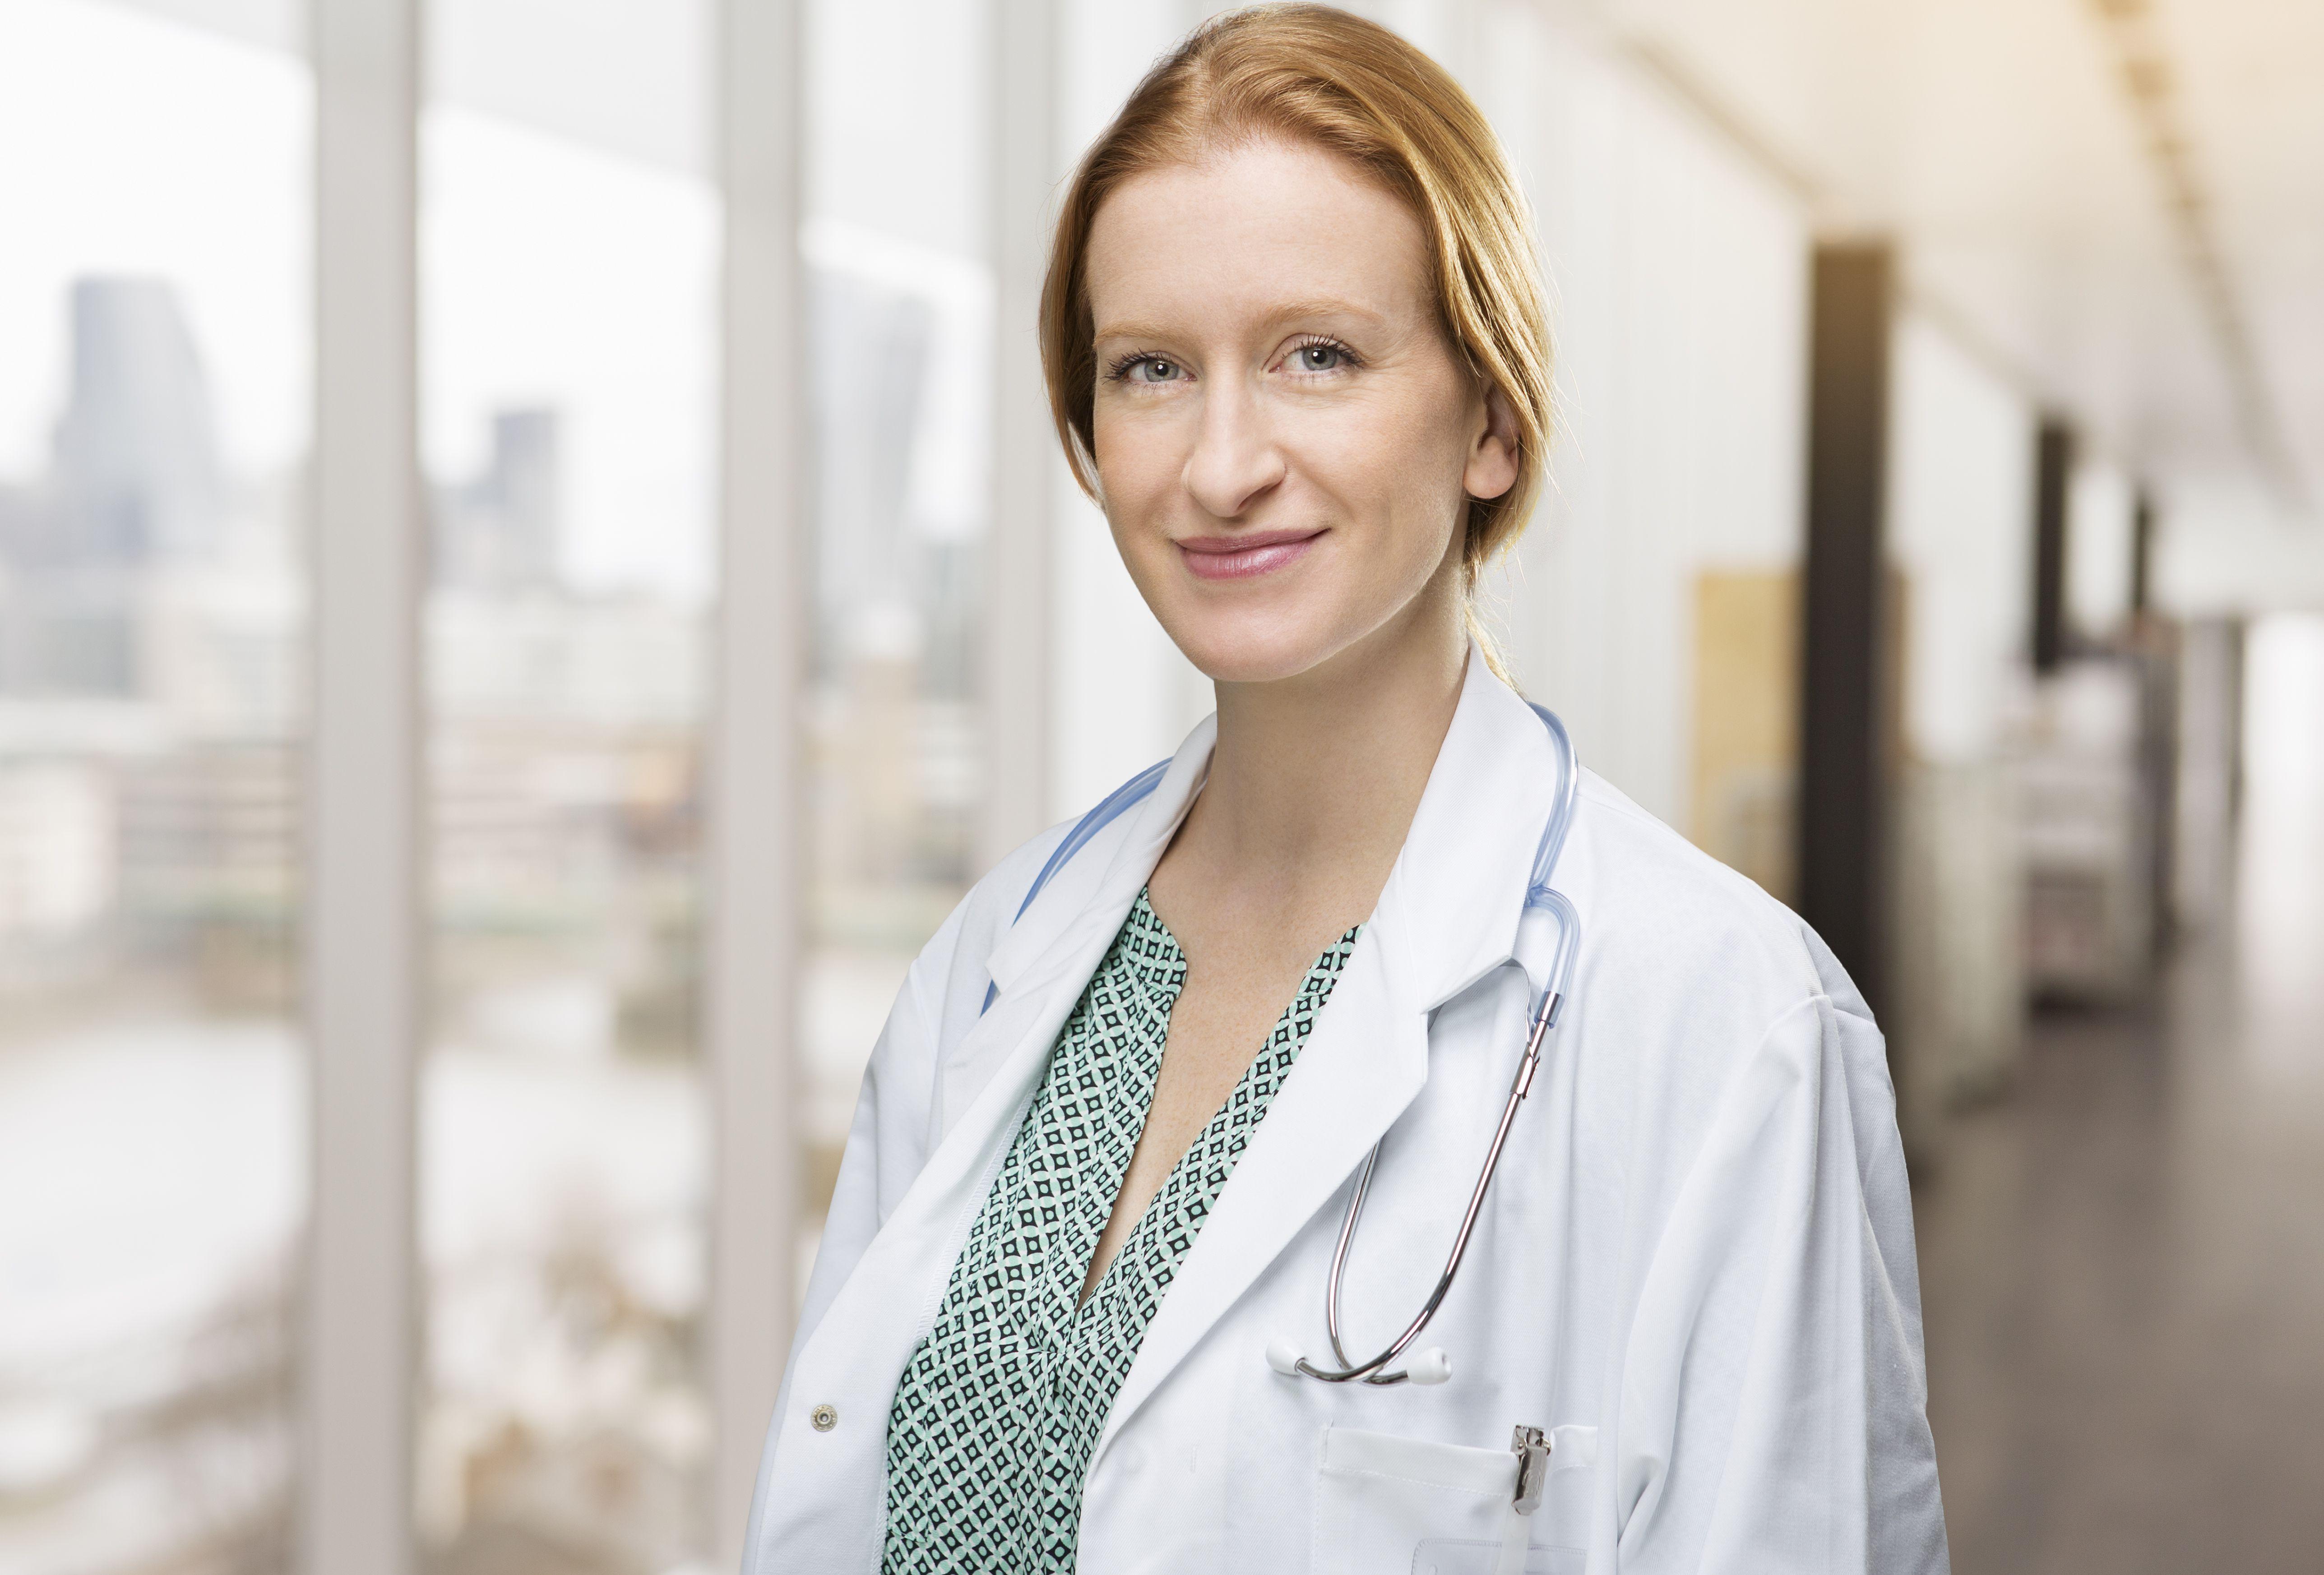 Portrait of female doctor in corridor in hospital.